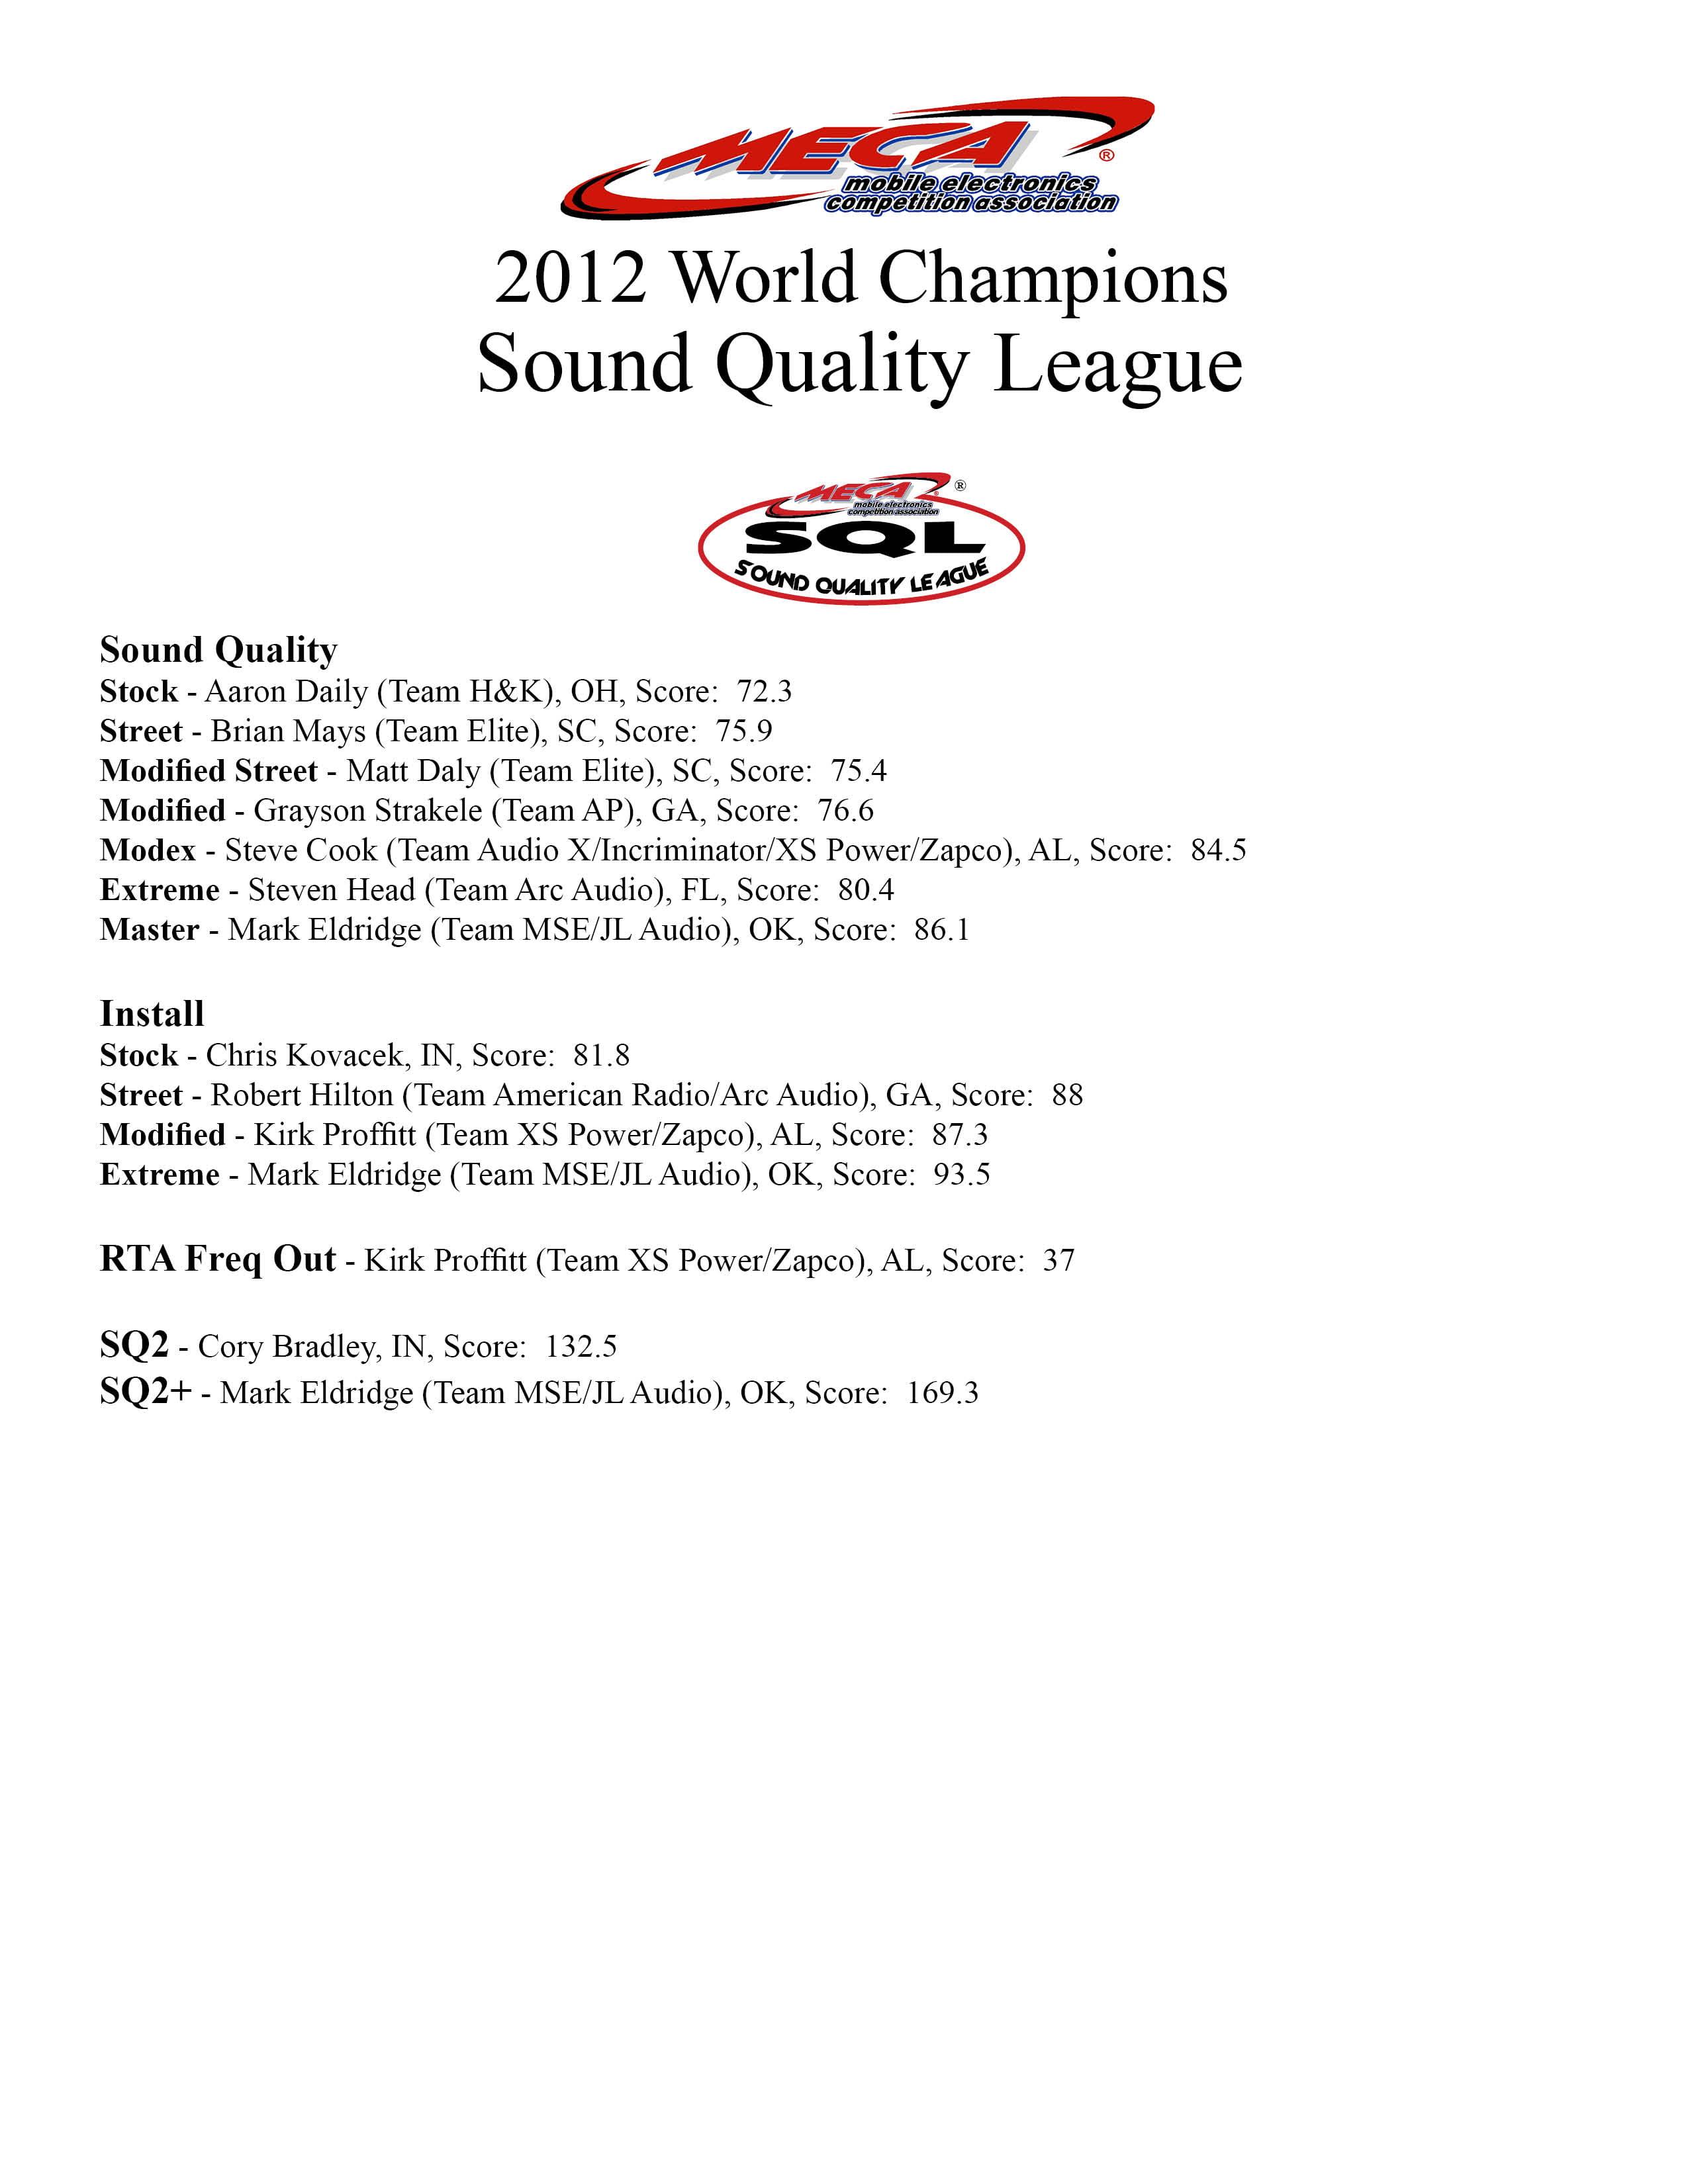 2012 Sound Quality League Champions